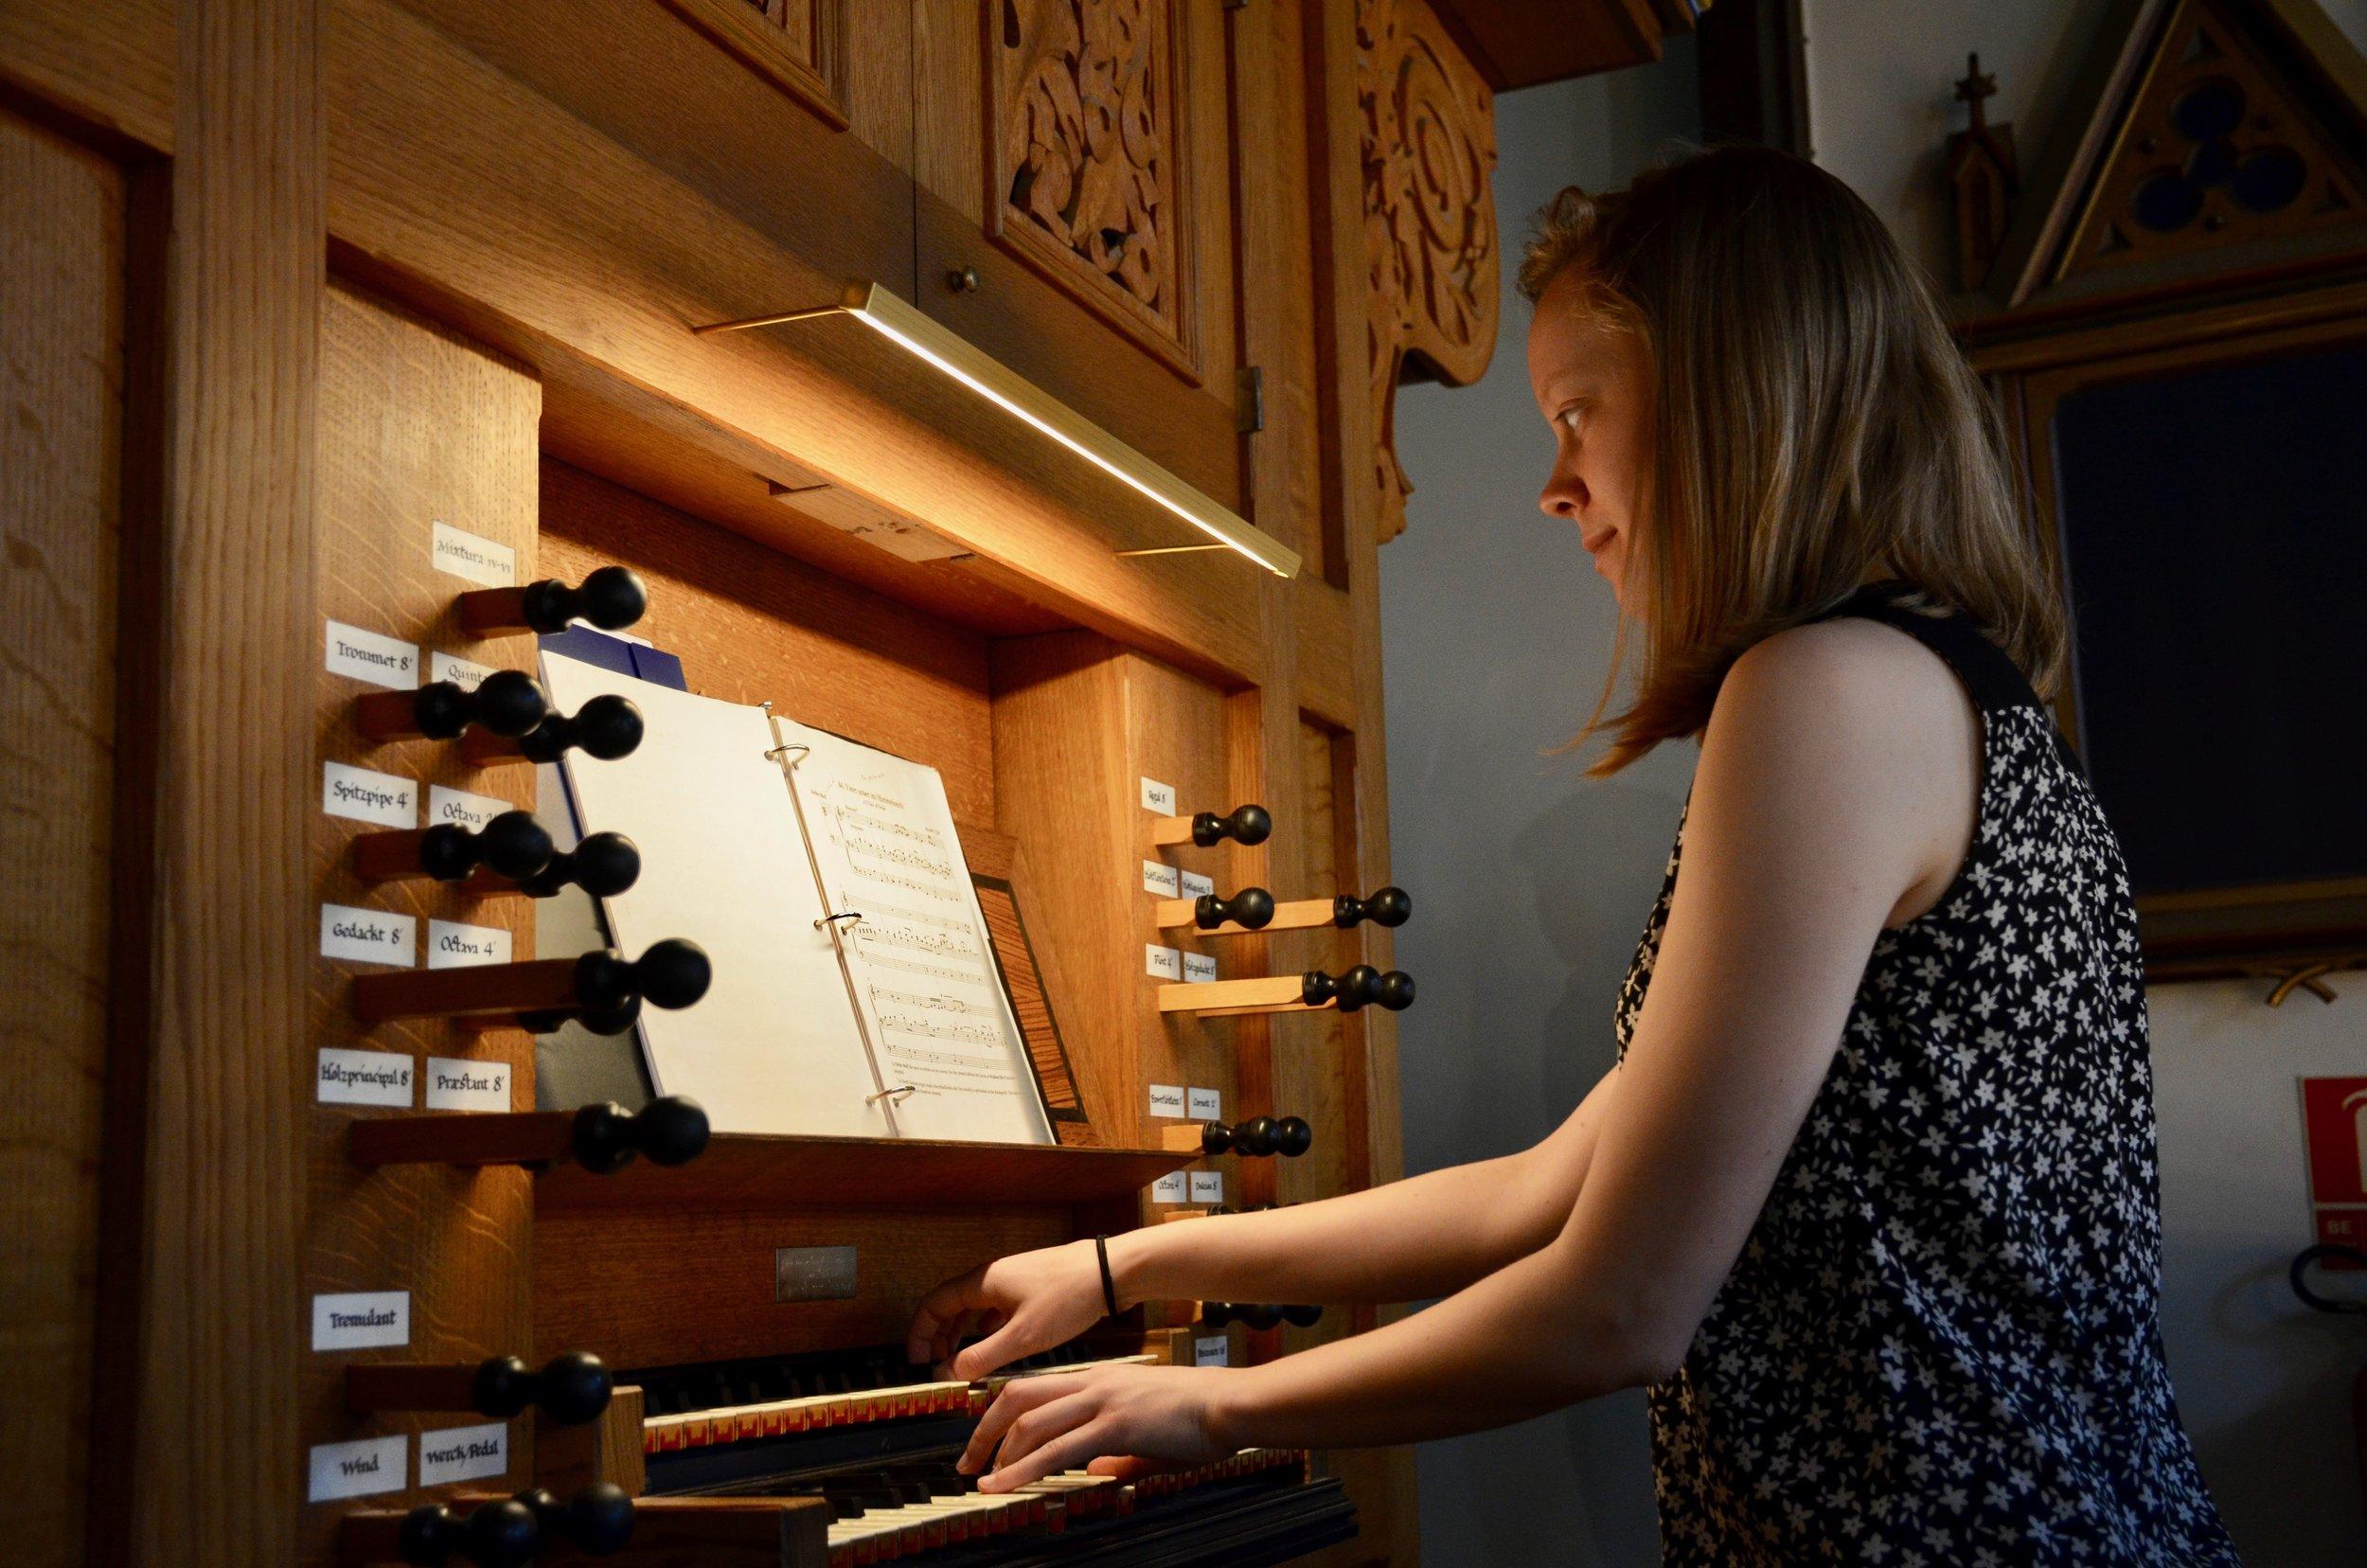 Laura Gullett plays the 1992 Brombaugh organ, Haga Church, Göteborg, Sweden.